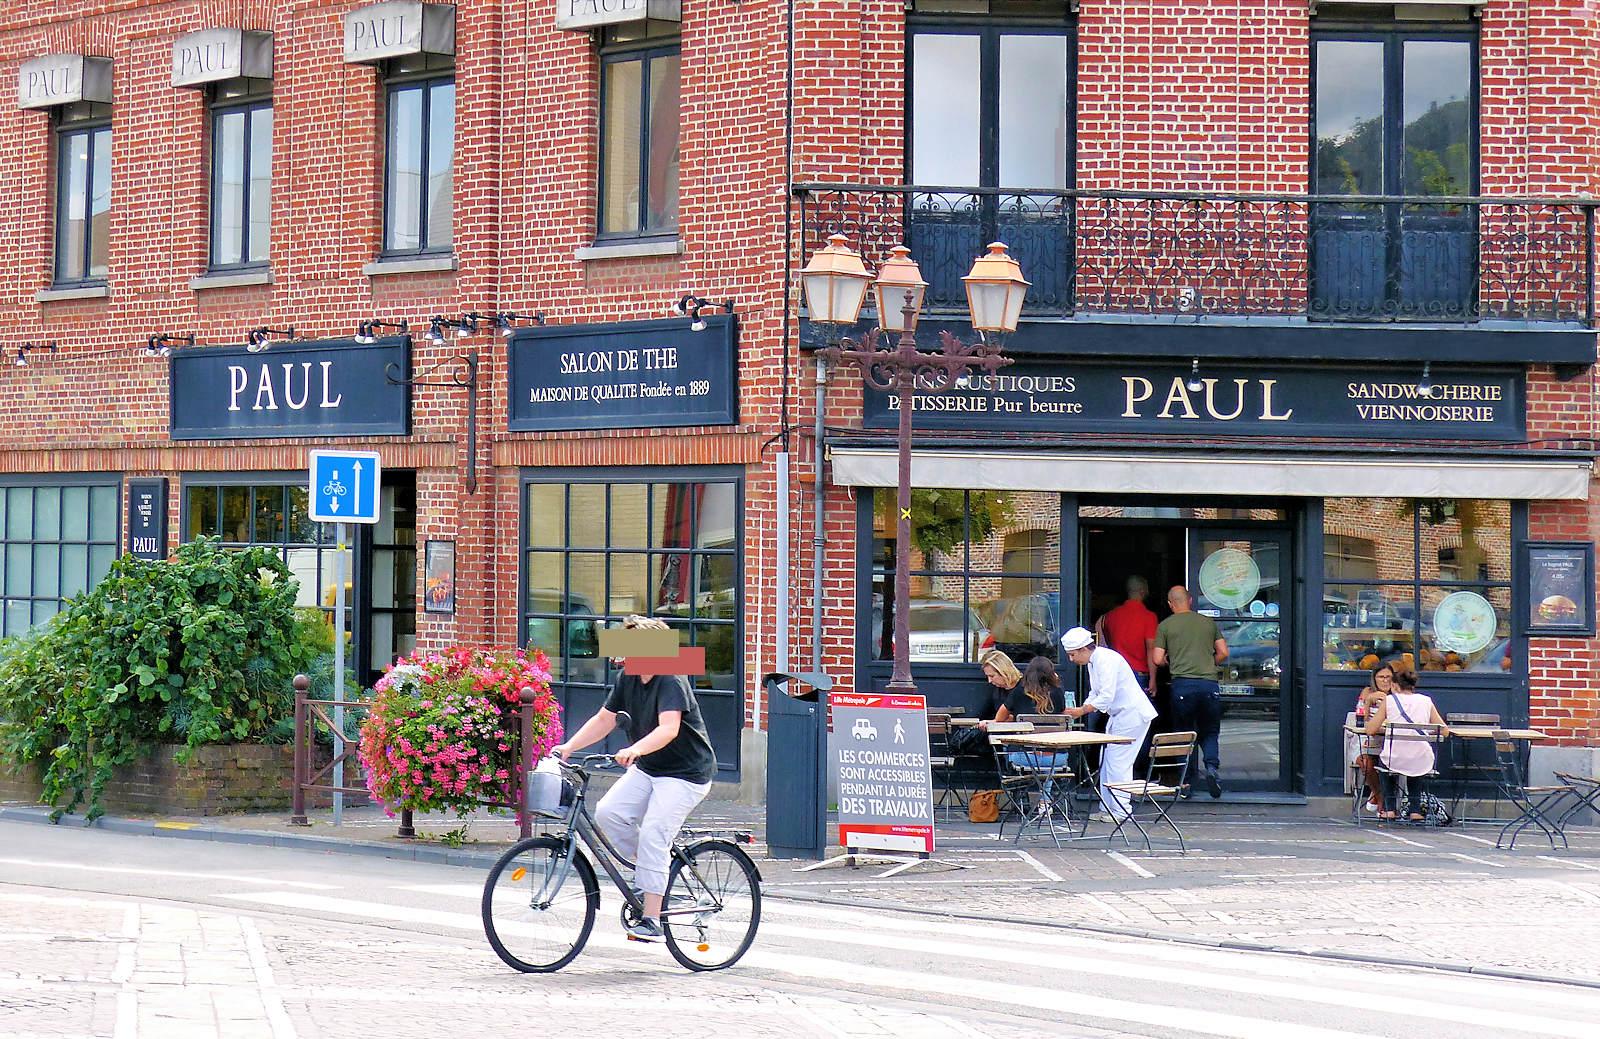 Paul Saint-Jacques, Tourcoing